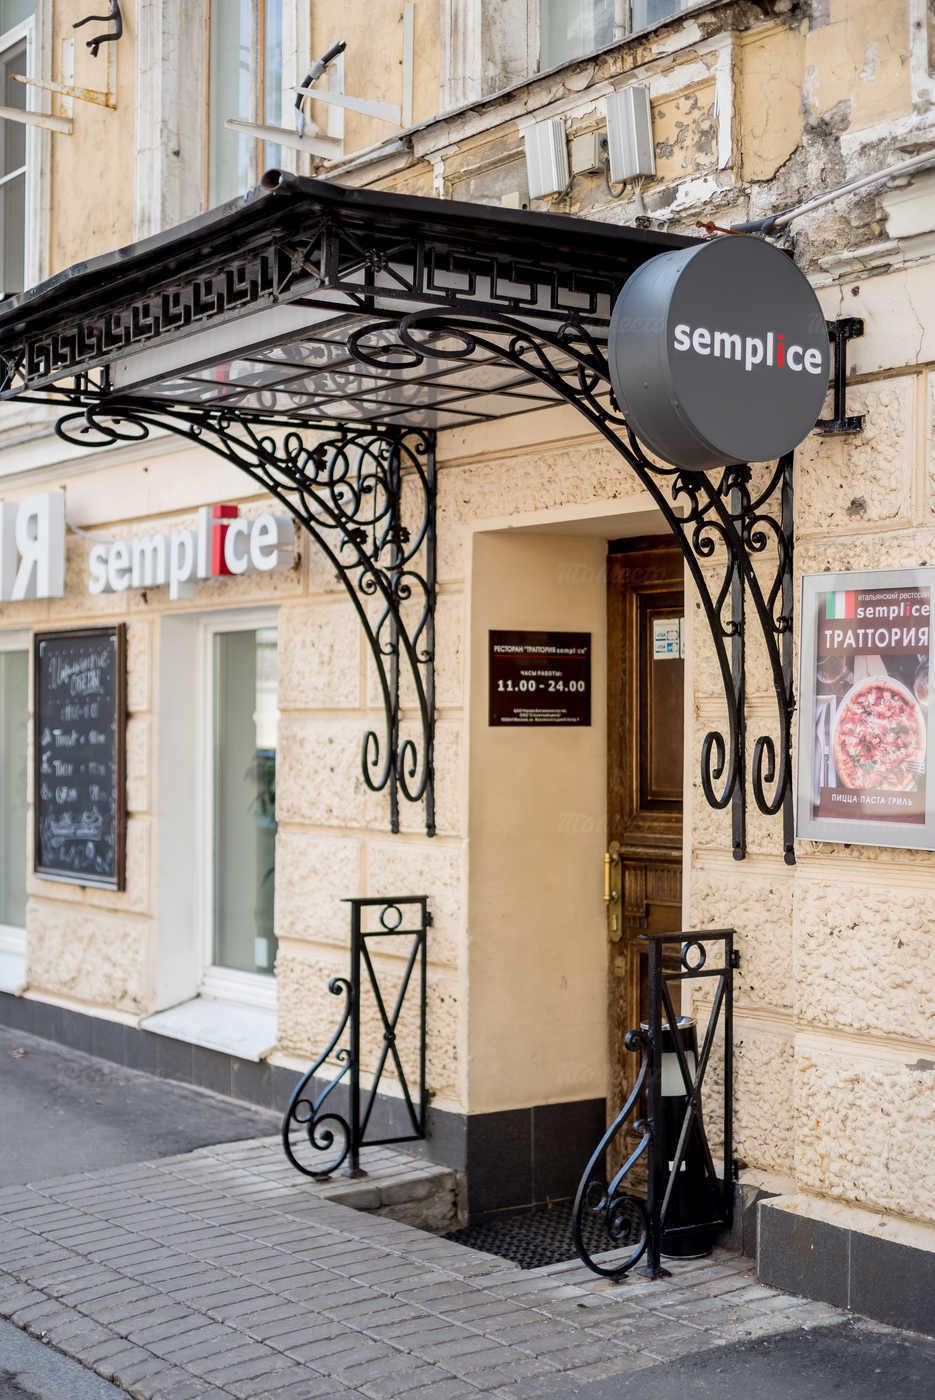 Ресторан Semplice (Траттория Семпличе) на улице Чаплыгина фото 23